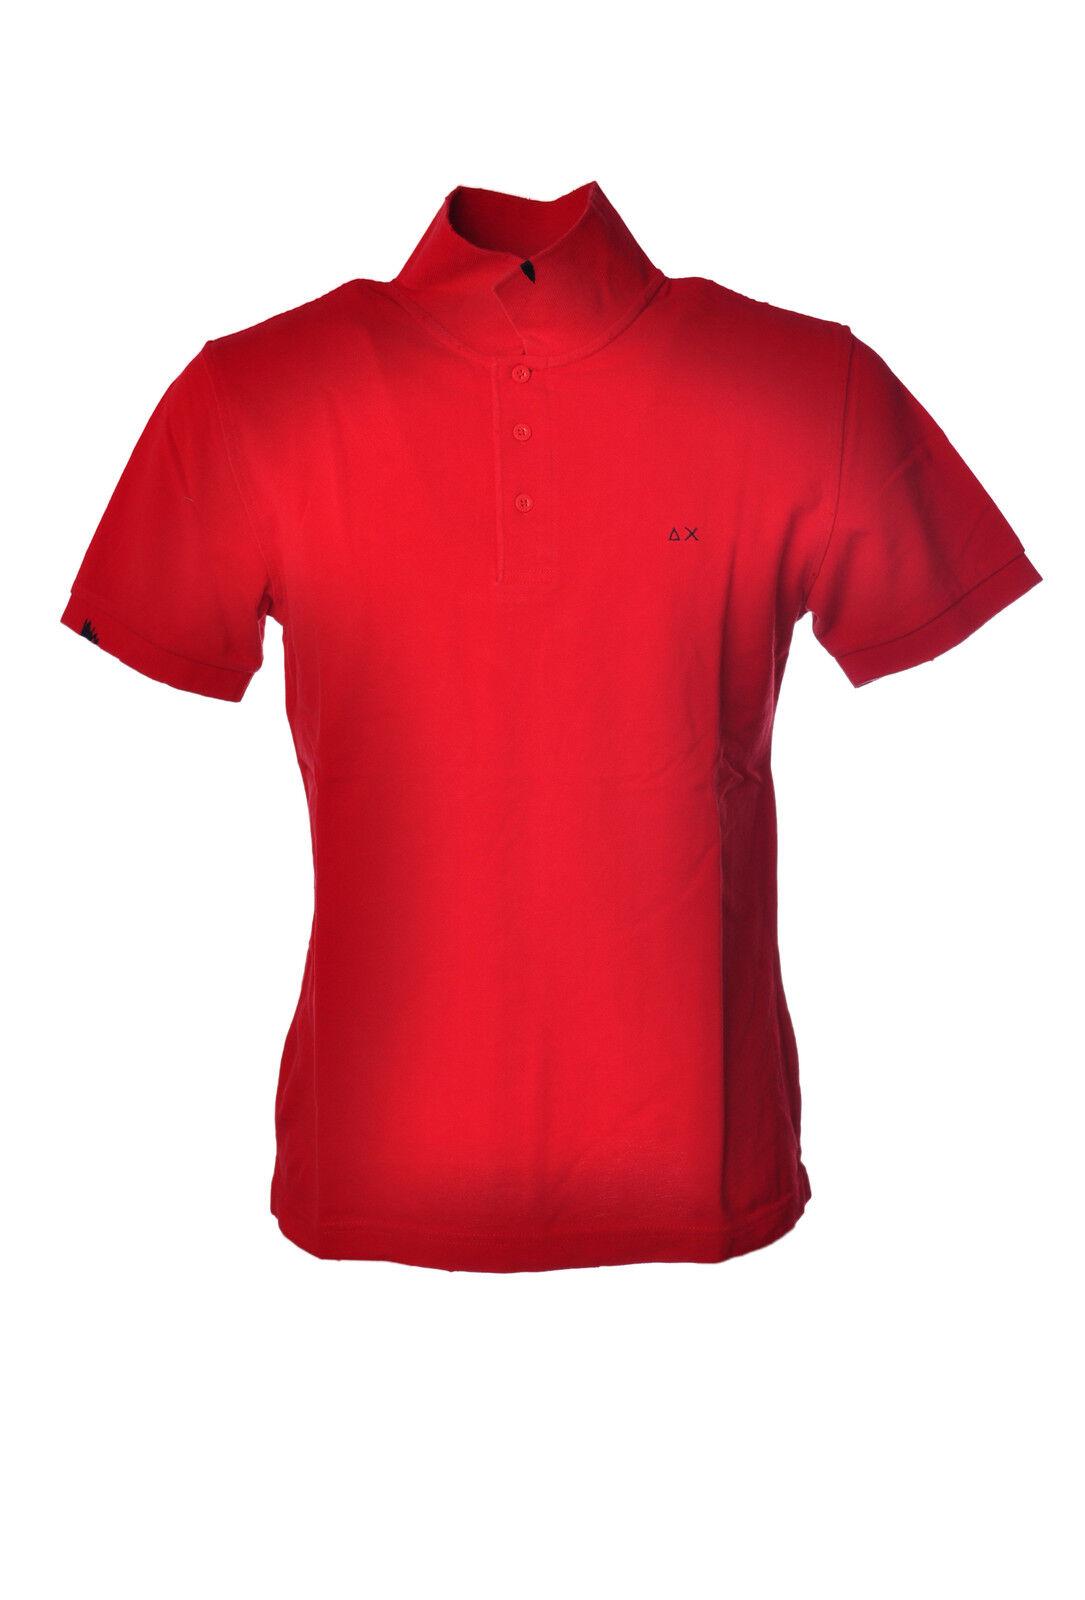 Sun 68 - - Topwear-Polo - Man - rosso - 68 3186710H184252 8275fe